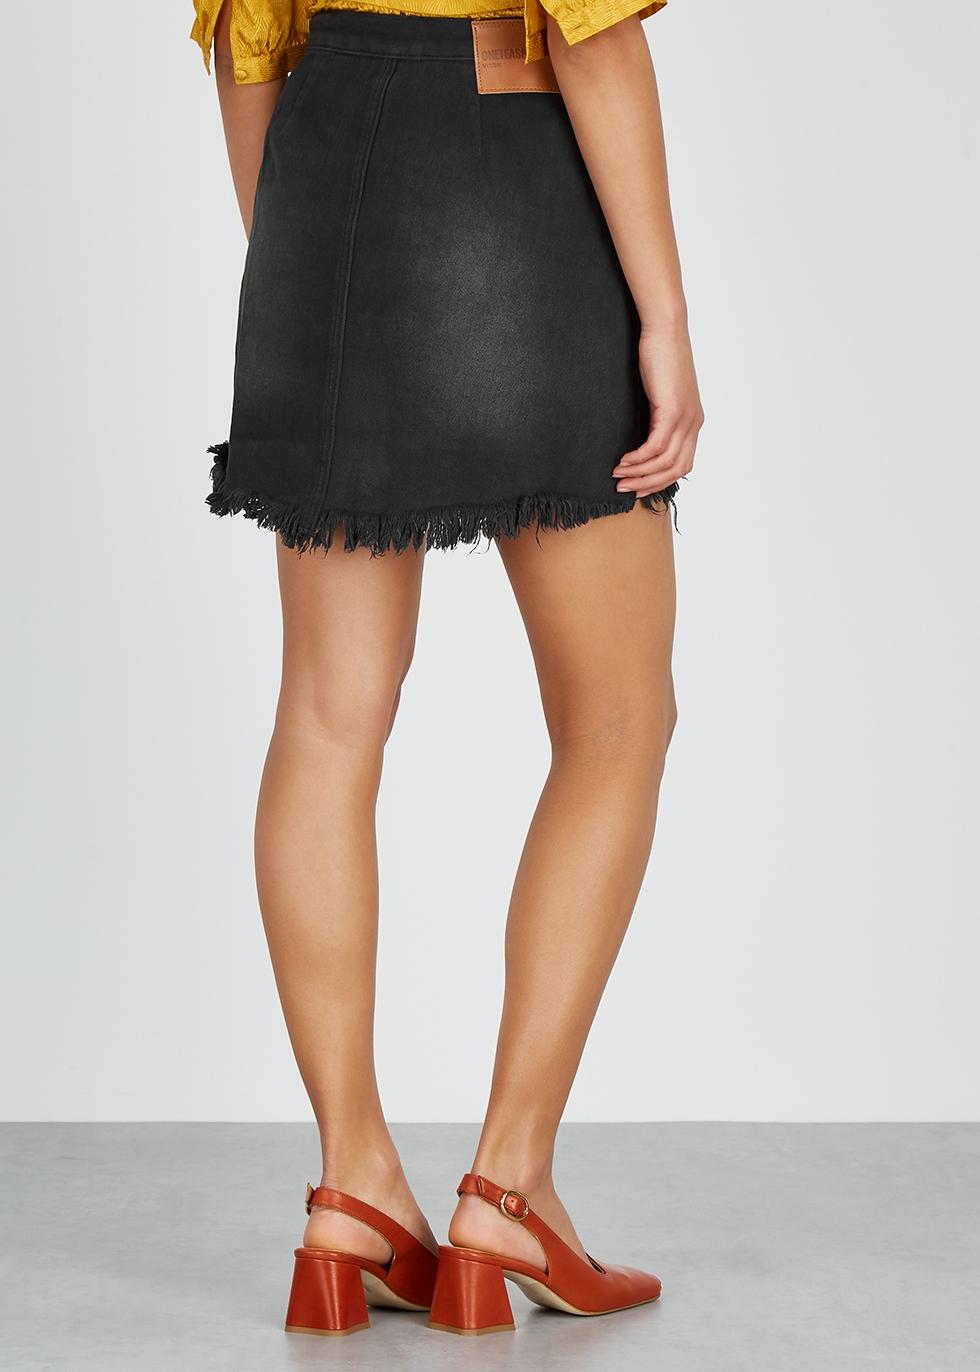 Vixen distressed denim mini skirt - Oneteaspoon